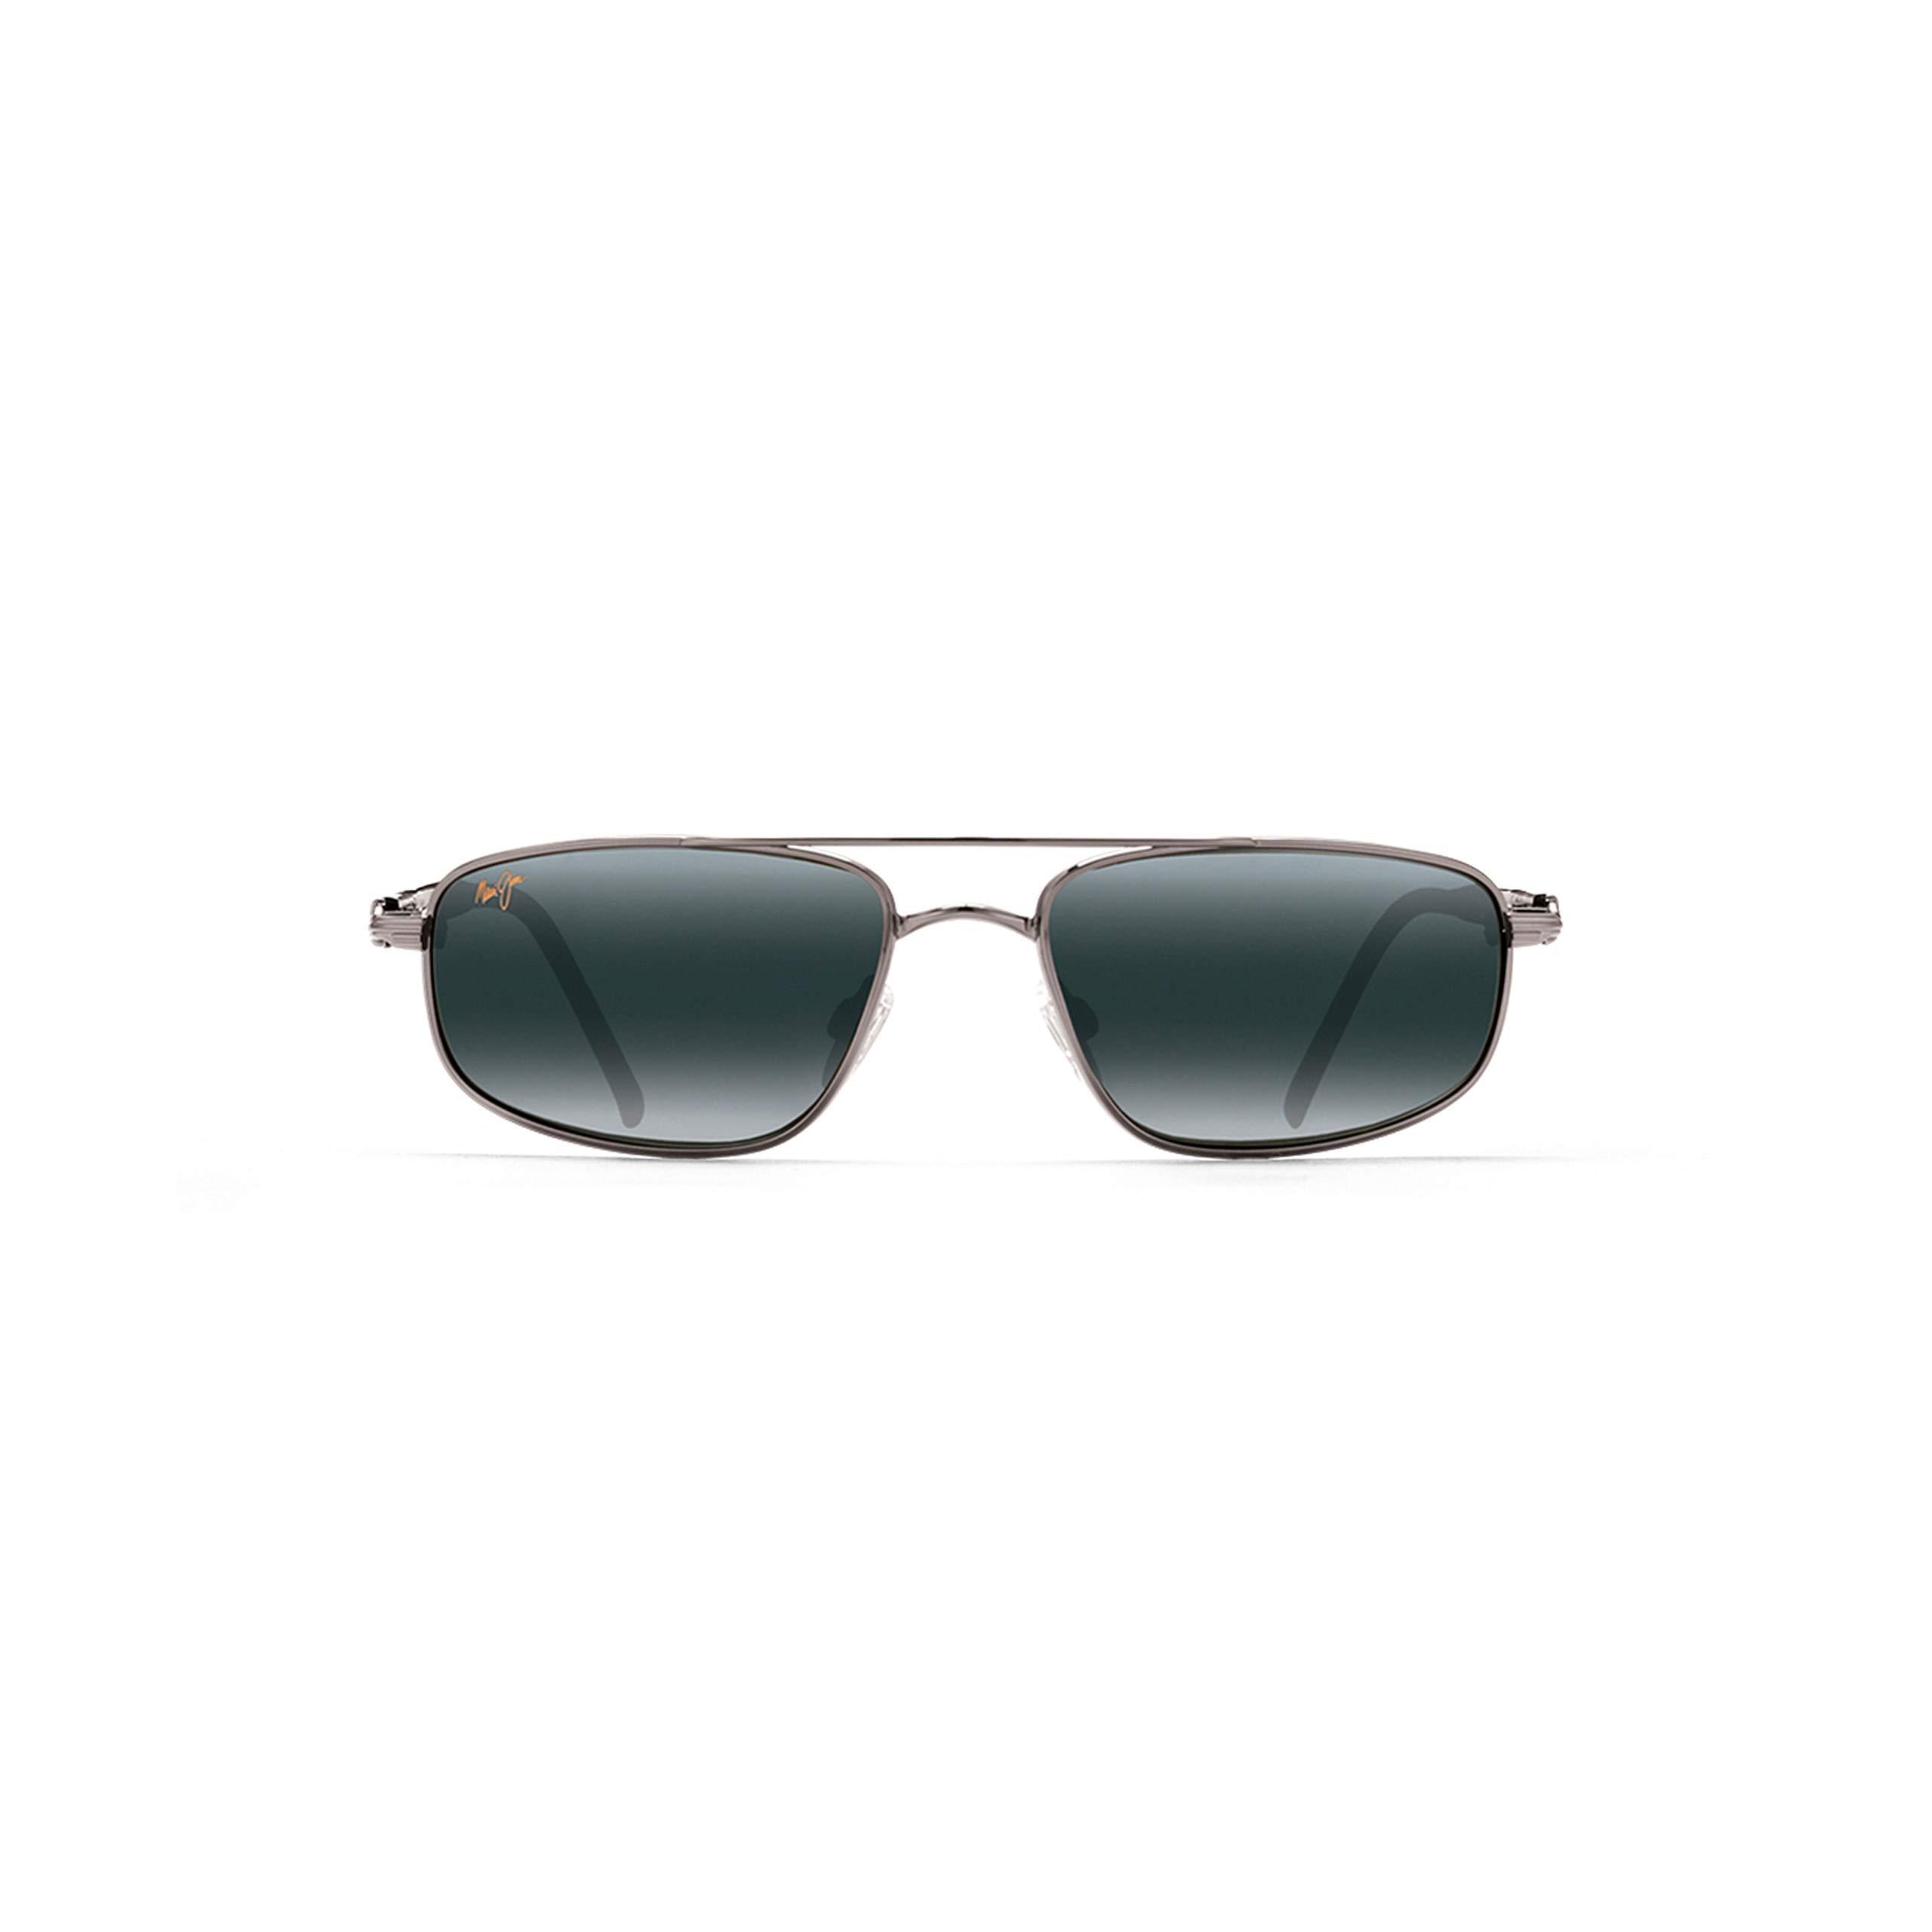 ef85b1f83f93 Best Rated in Girls  Sunglasses   Helpful Customer Reviews - Amazon.com